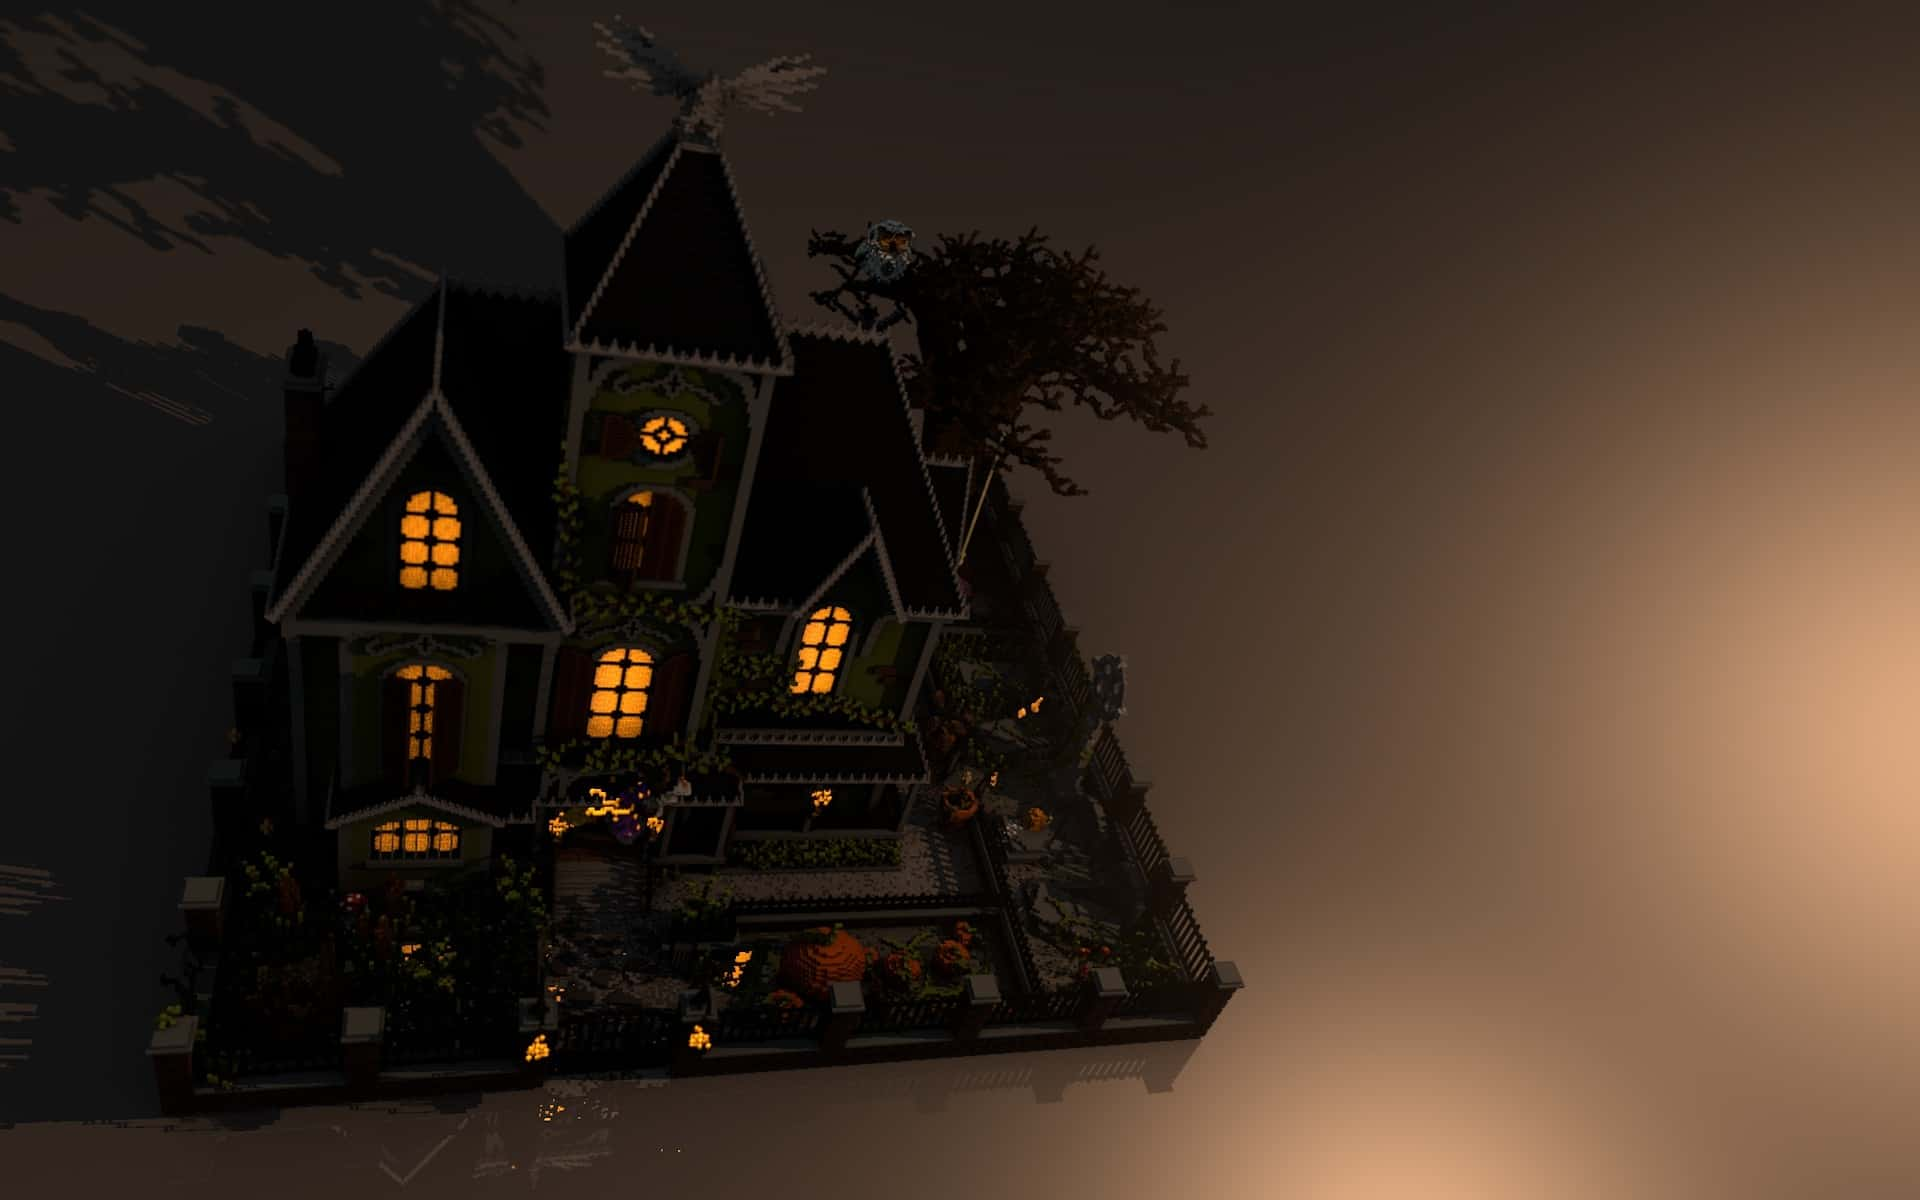 map le projet blair witch 1 8 minecraft france. Black Bedroom Furniture Sets. Home Design Ideas